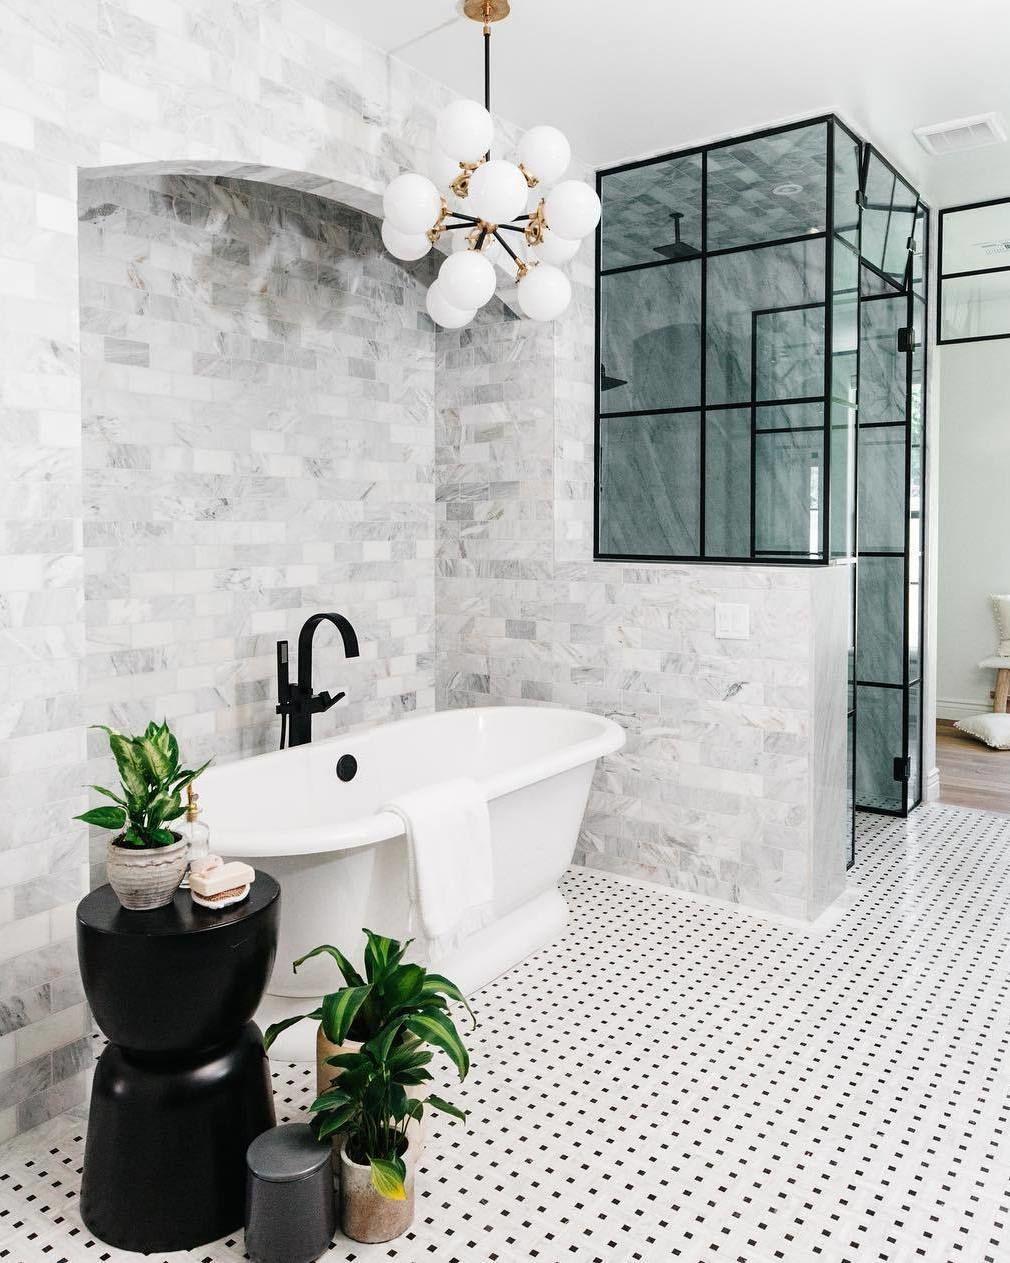 Which Do You Prefer After A Long Da Bathroom Interior Design Bathroom Interior Bathroom Design